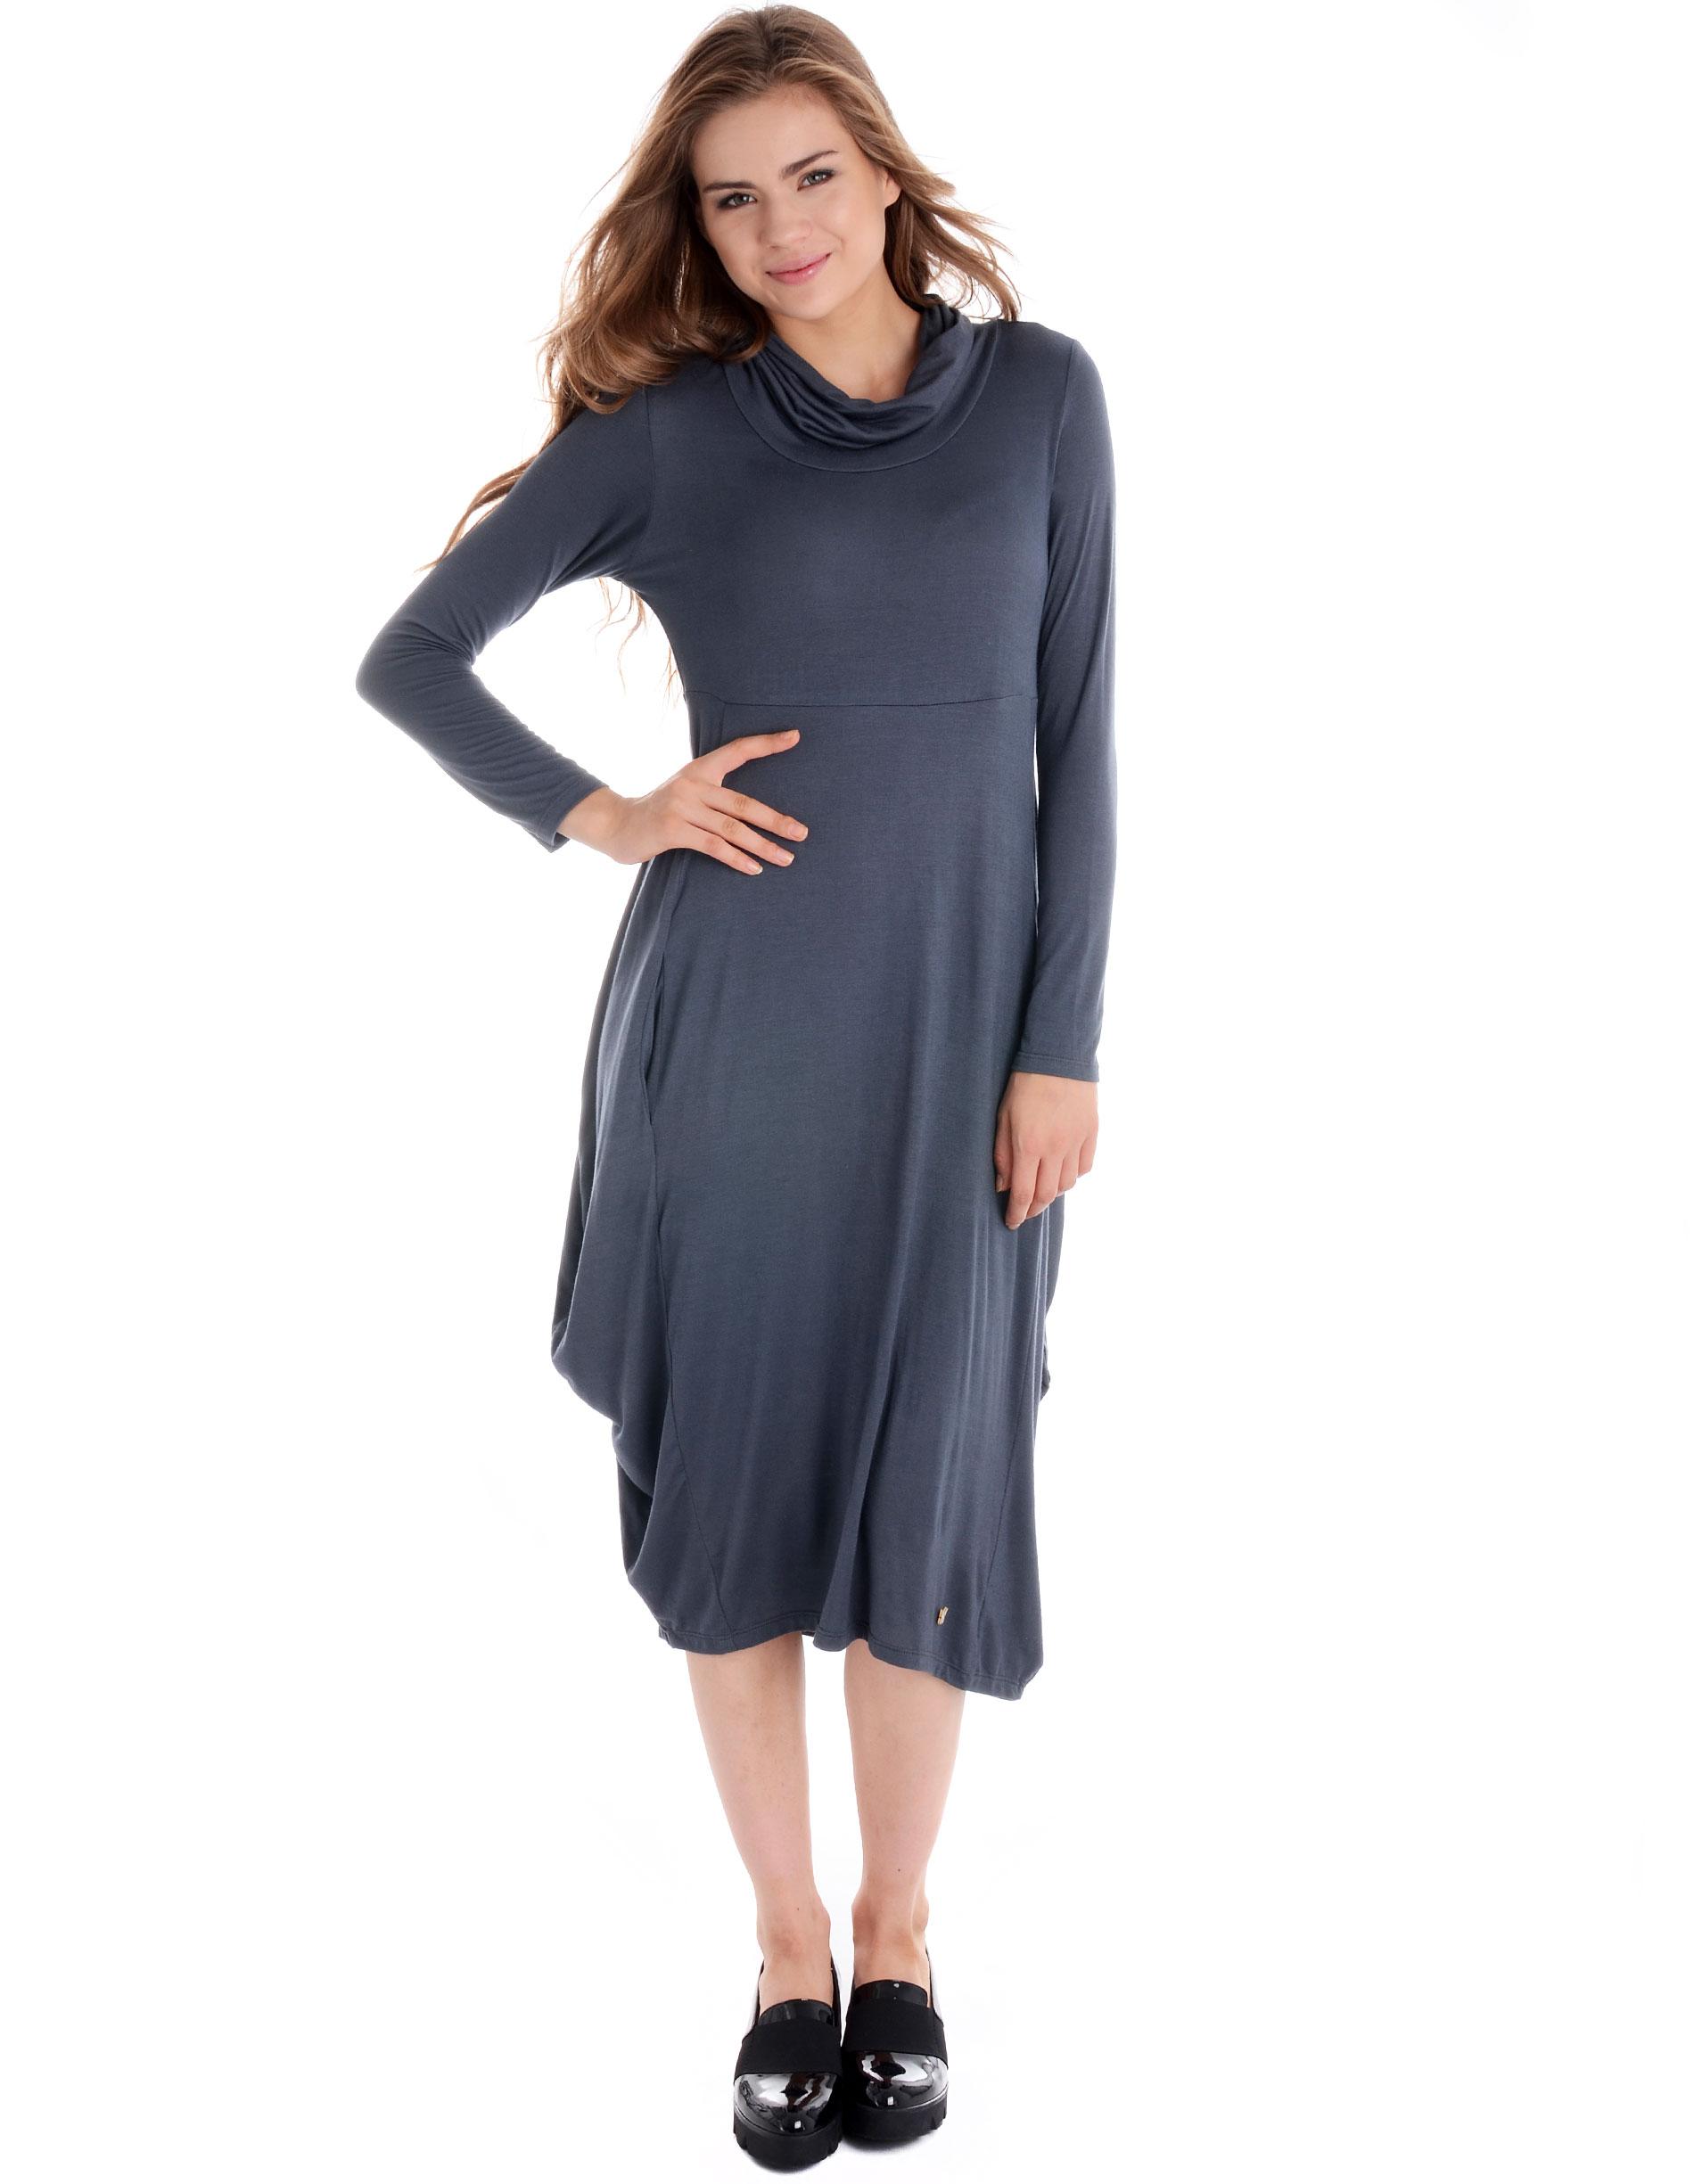 Sukienka - 119-153212D G - Unisono